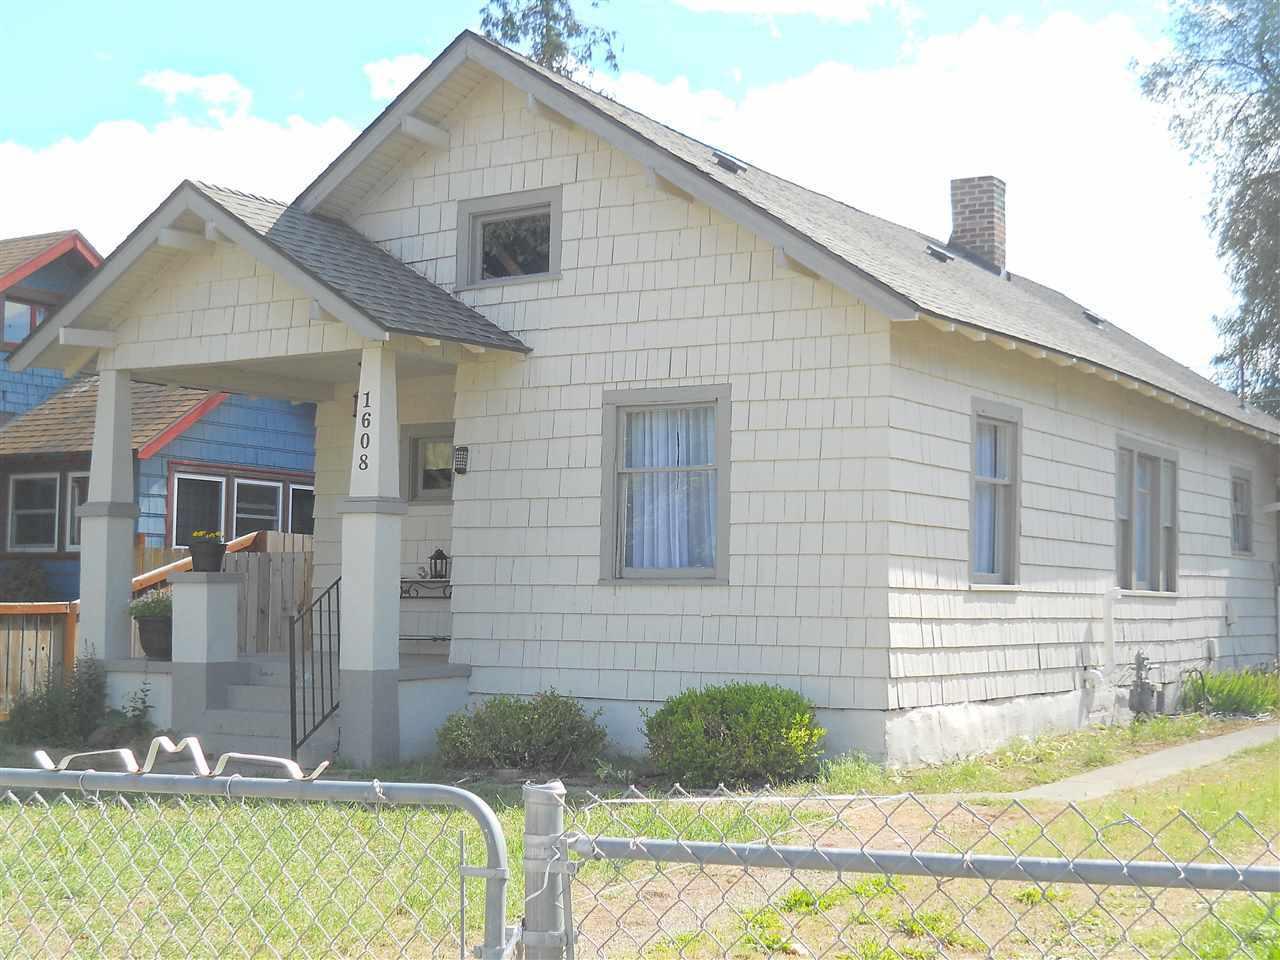 1608 N Crestline St, Spokane, WA - USA (photo 2)